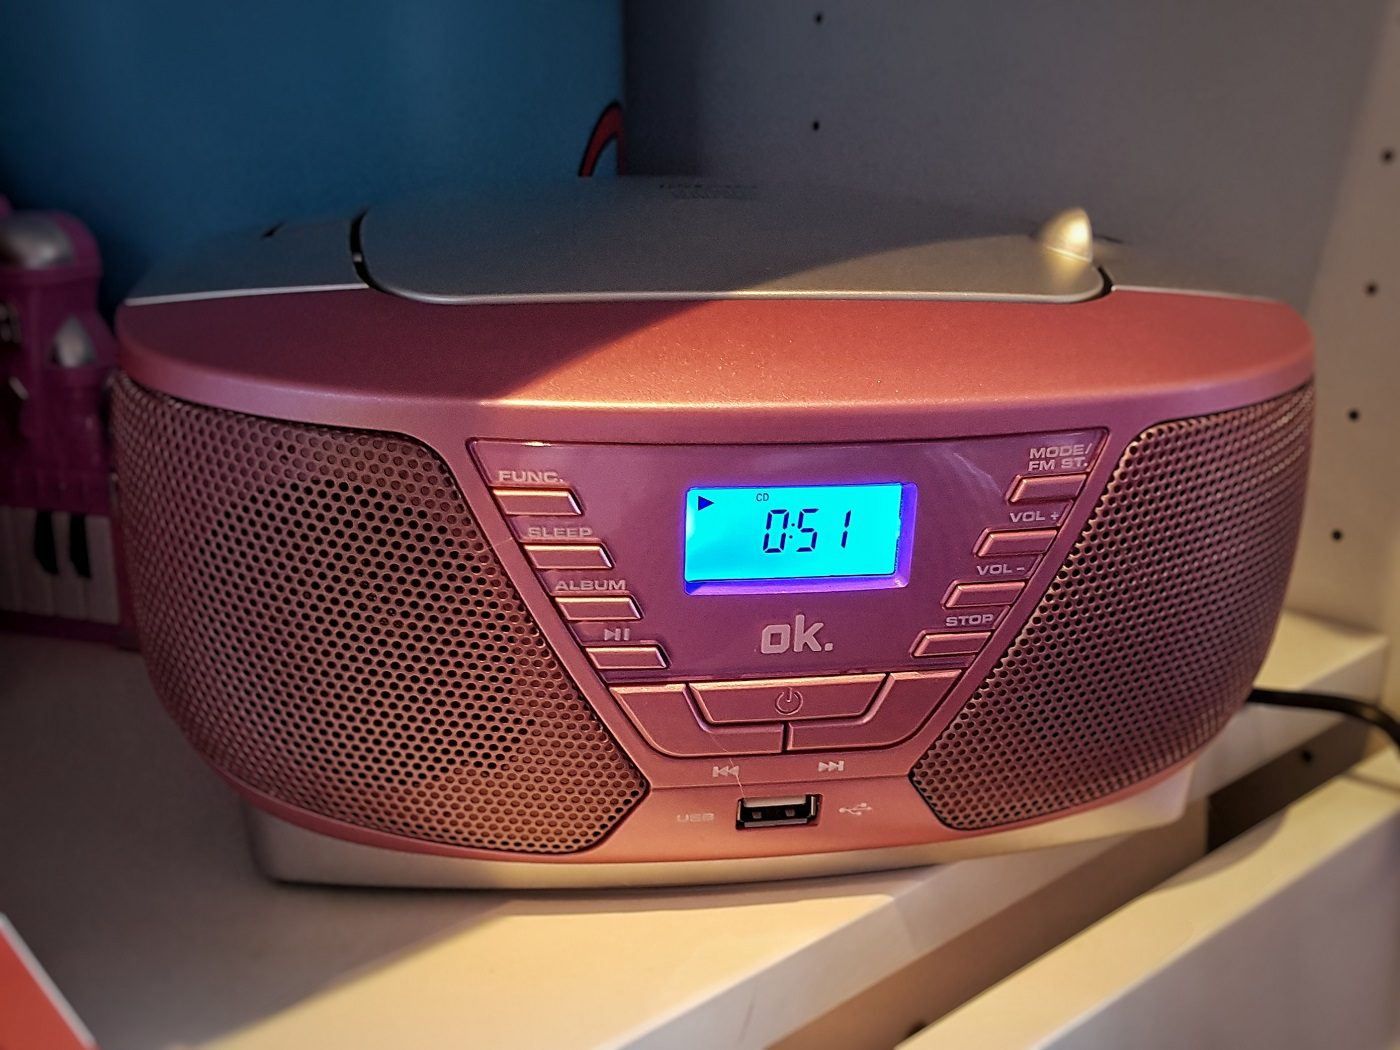 OK. ORC311 - Tragbarer Radiorecorder, Rosa